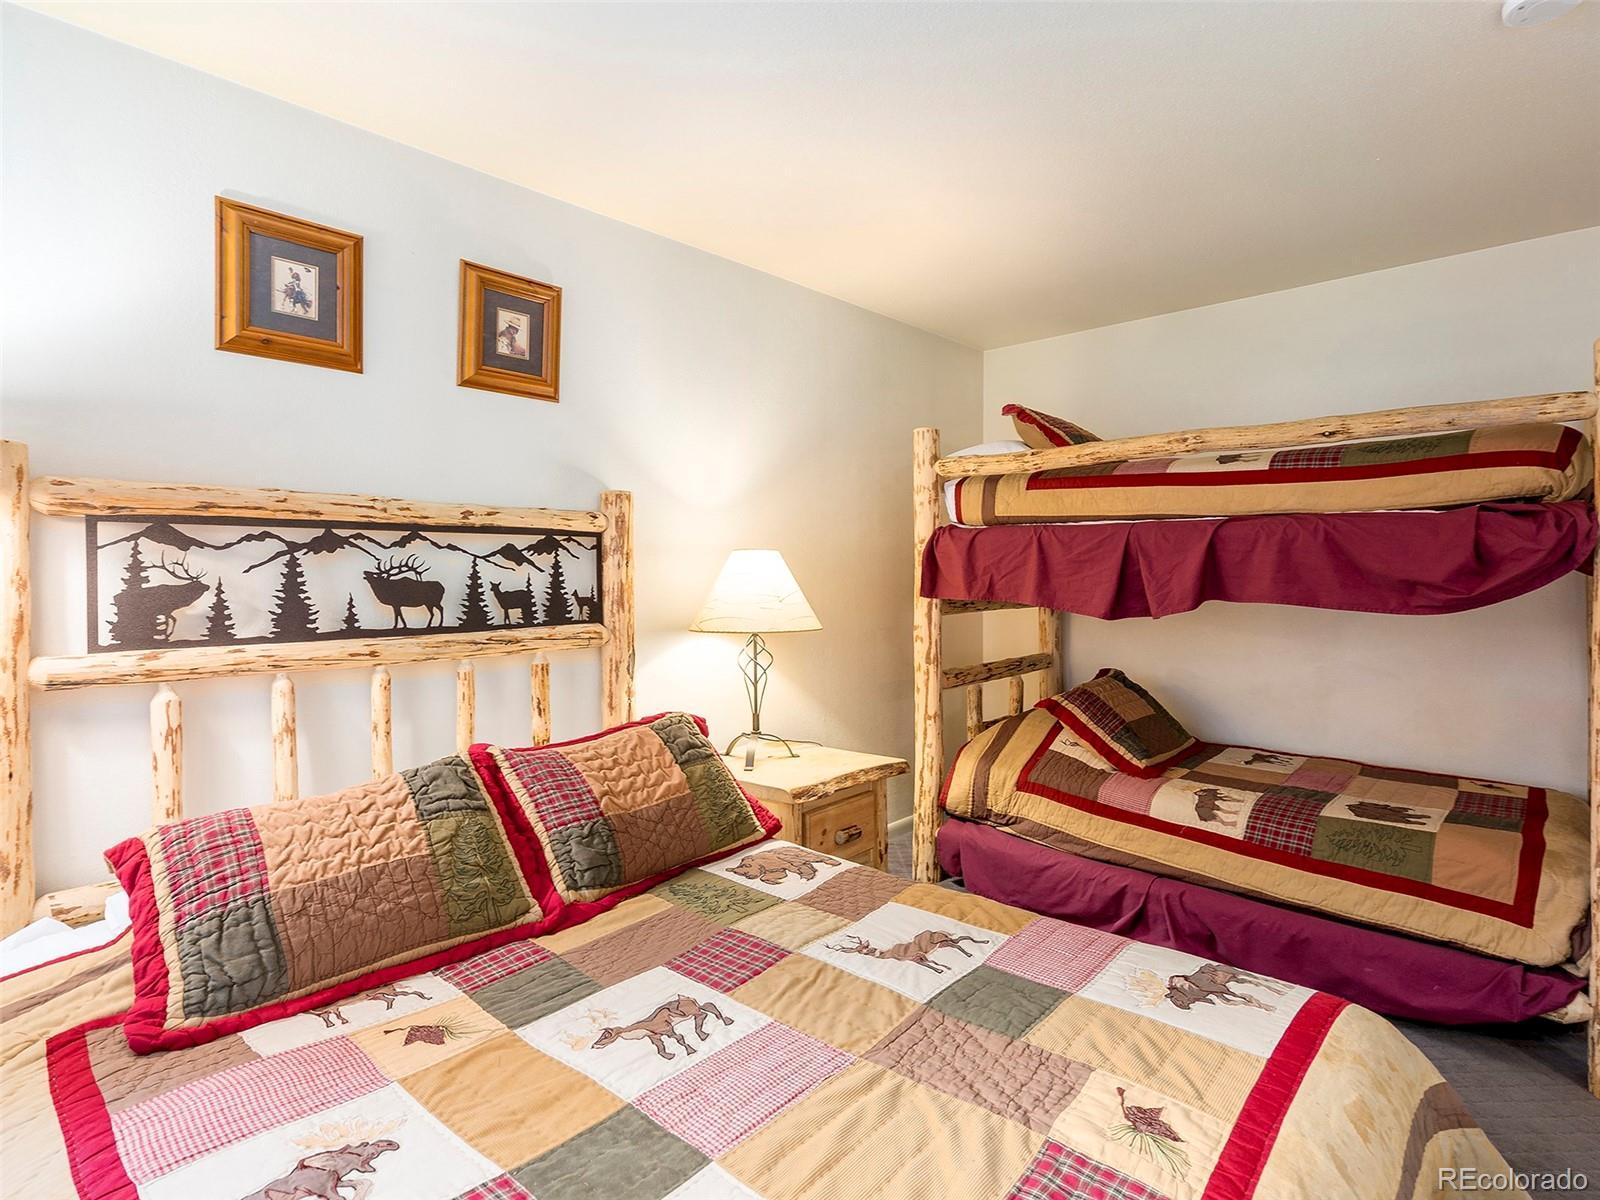 MLS# 4193338 - 13 - 2700 Village Drive #D-204, Steamboat Springs, CO 80487